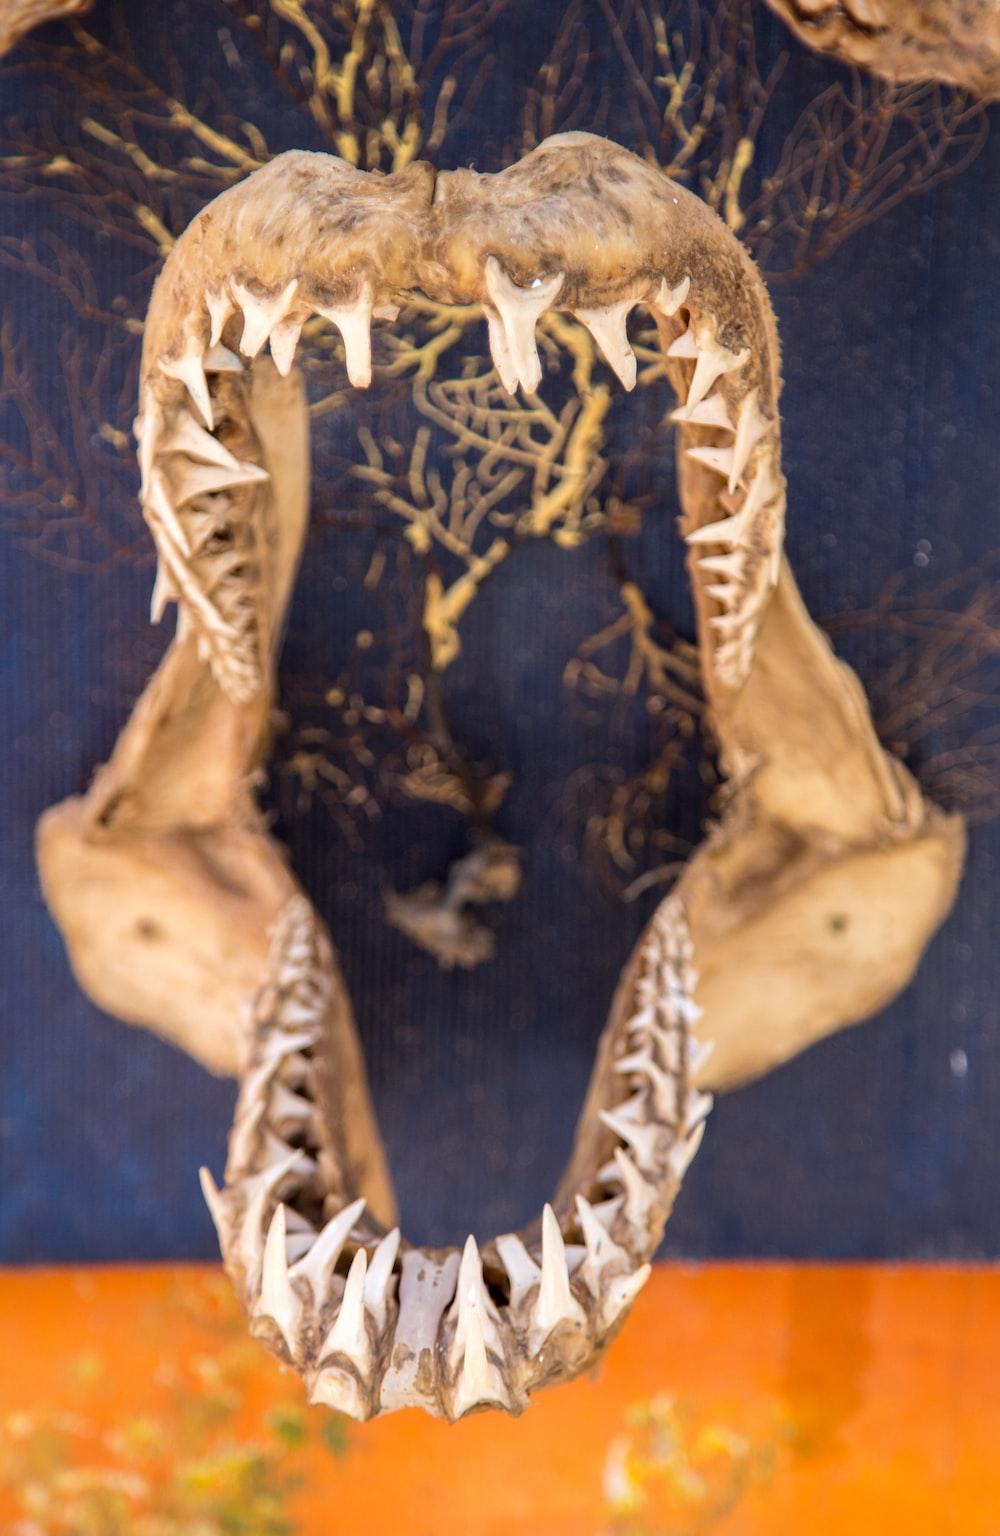 jaw bone skeleton of a shark